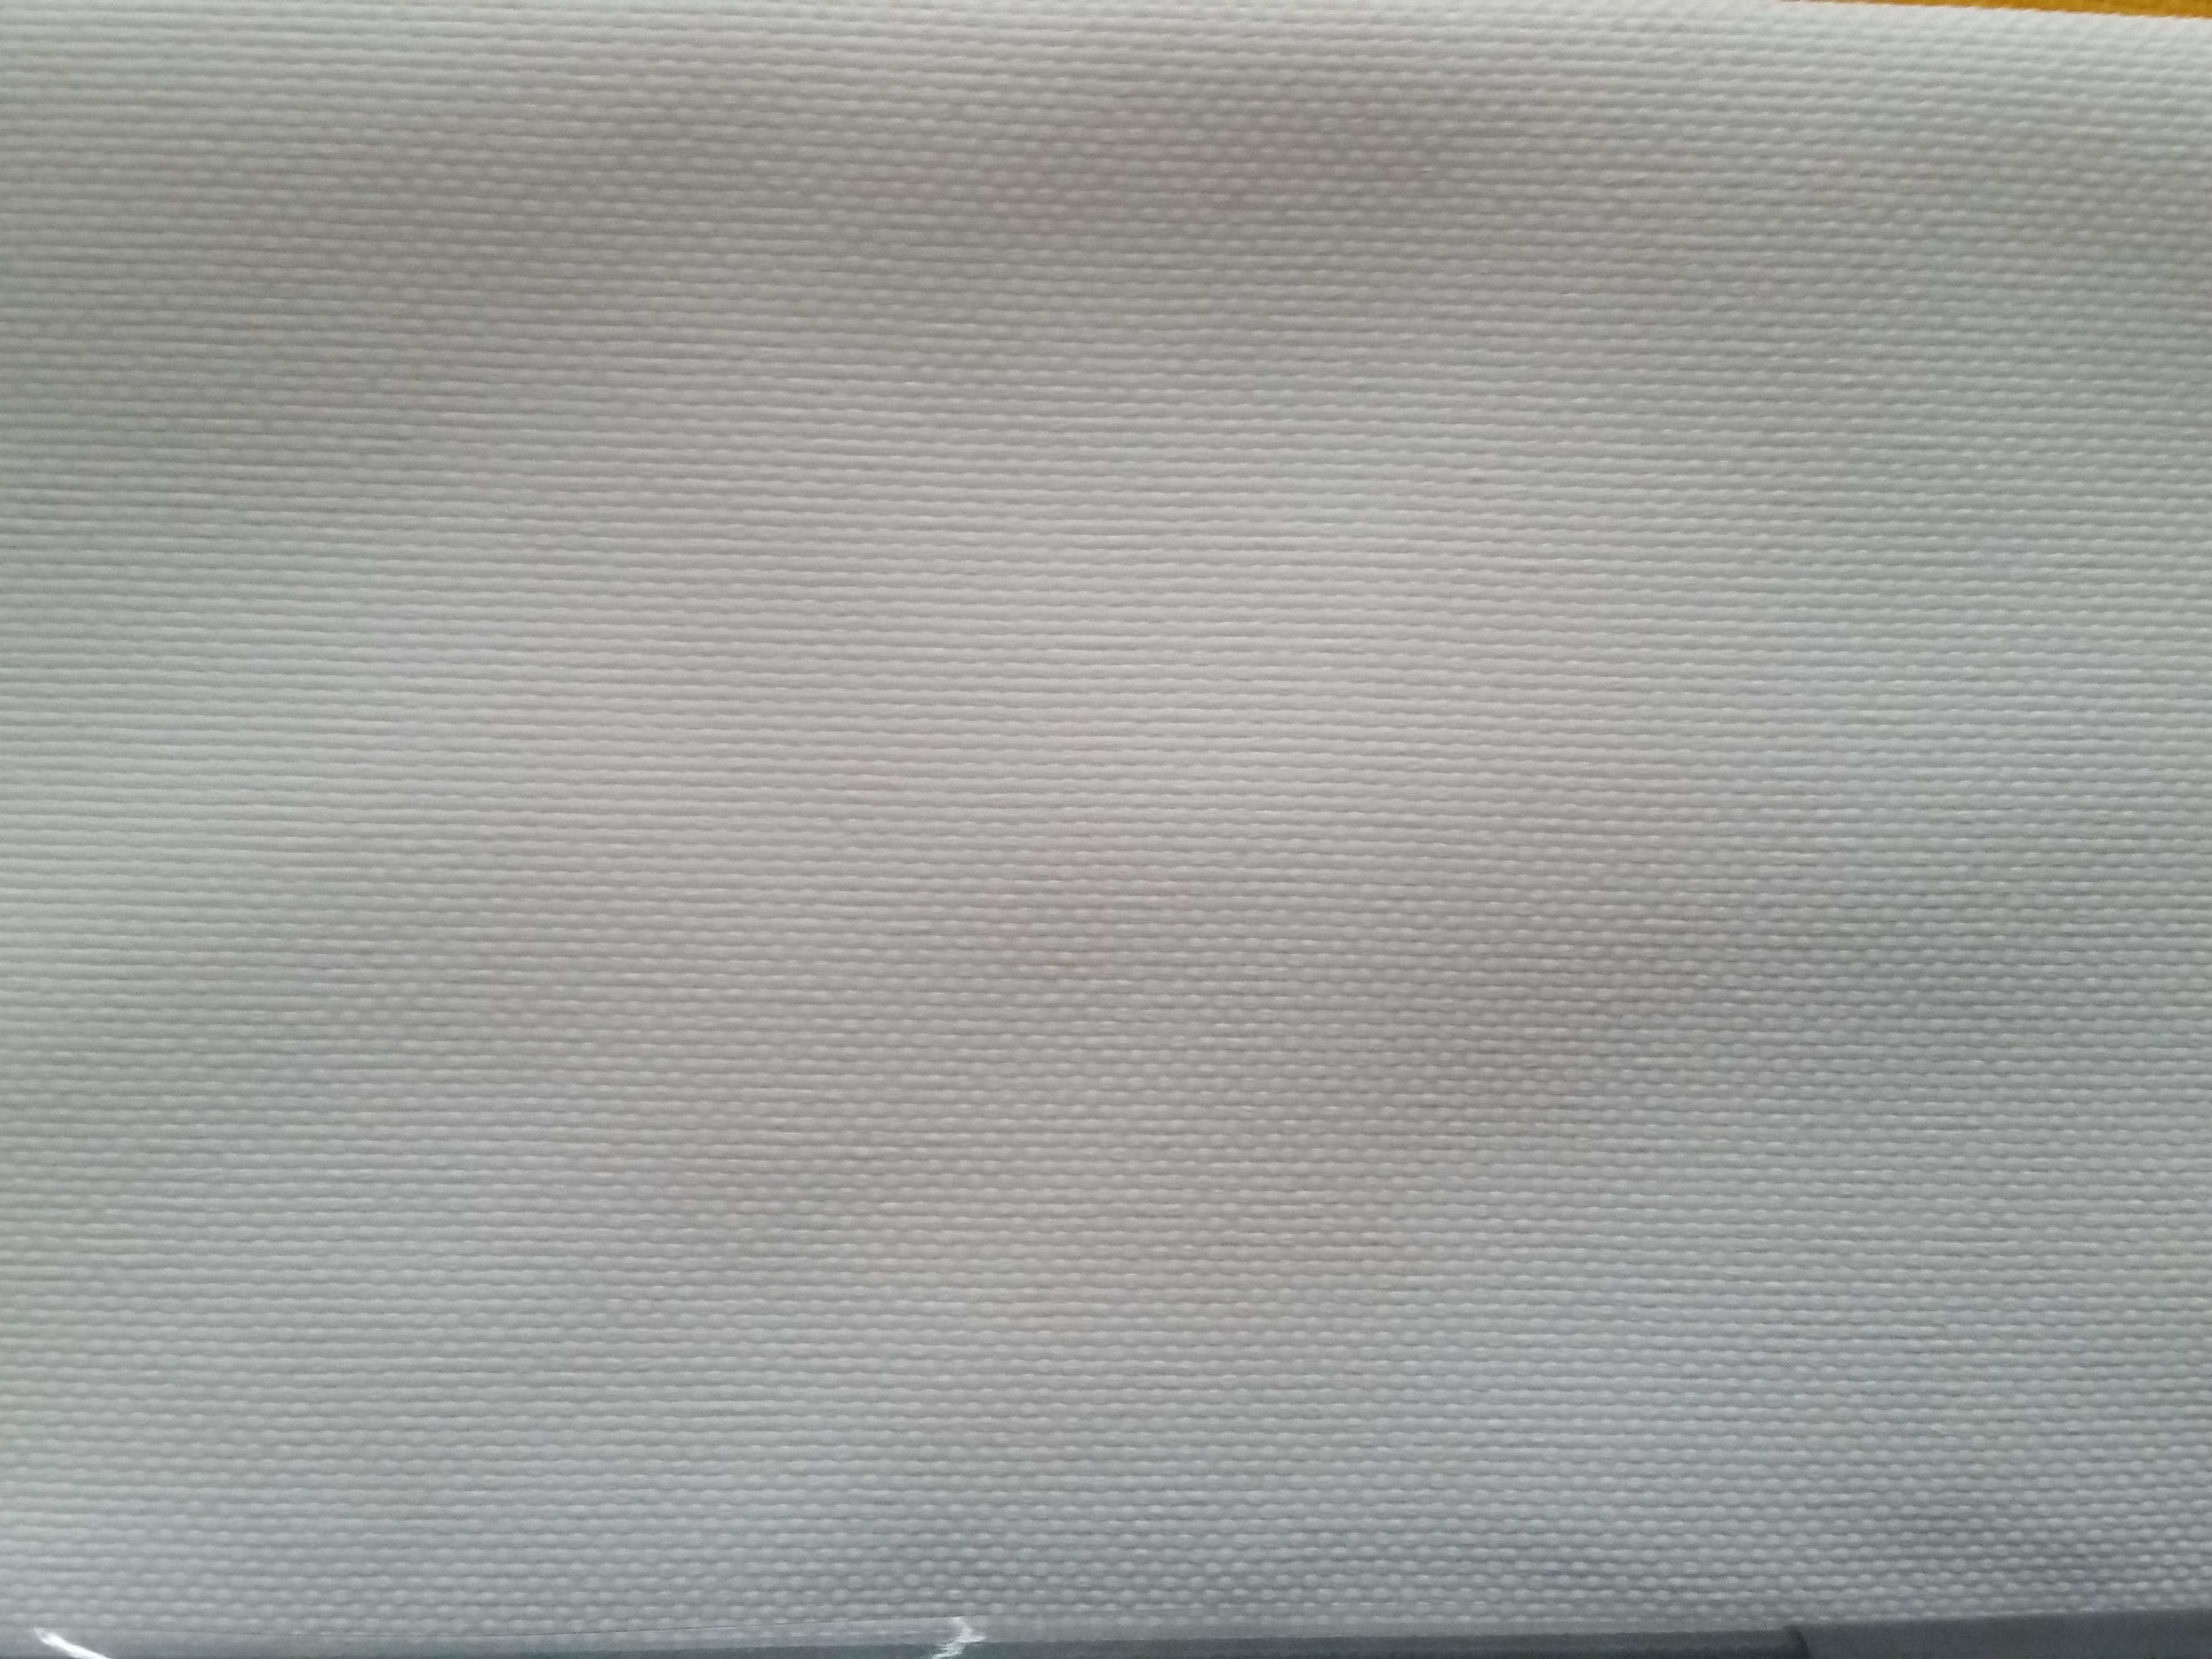 Warwick Outdoor Fabrics Kona Cloud